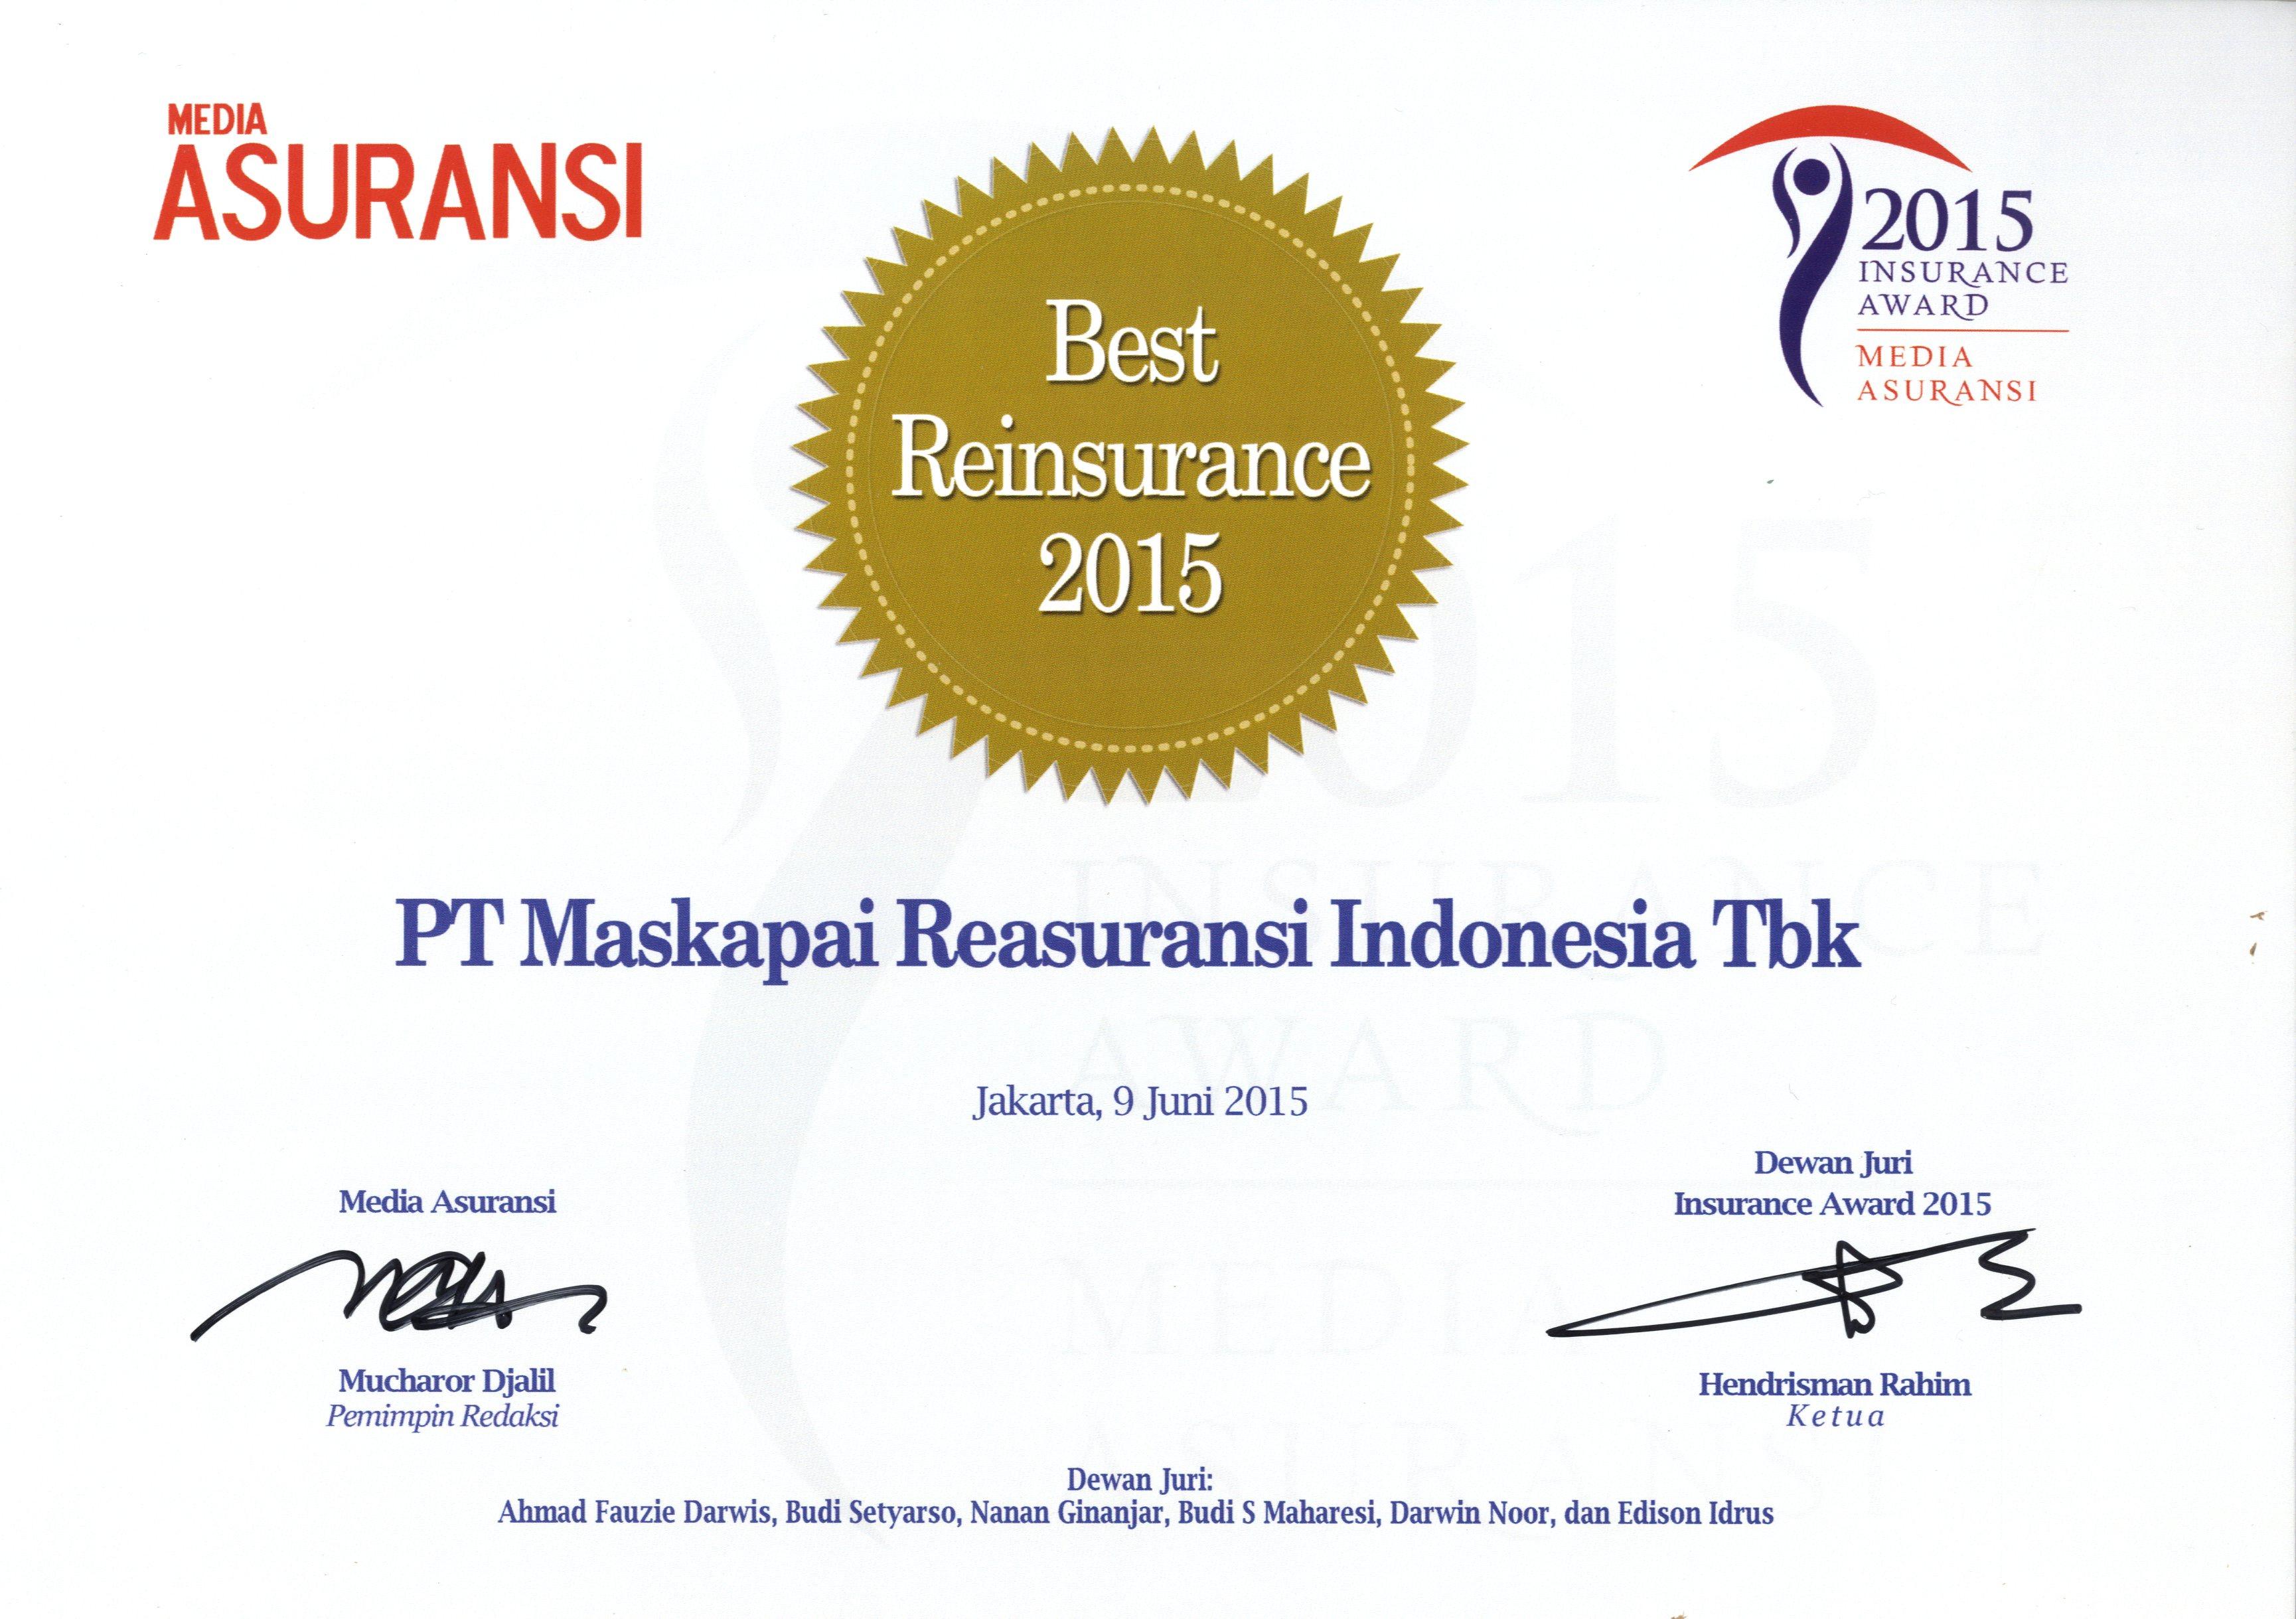 Majalah Media Asuransi : Best Reinsurance 2015